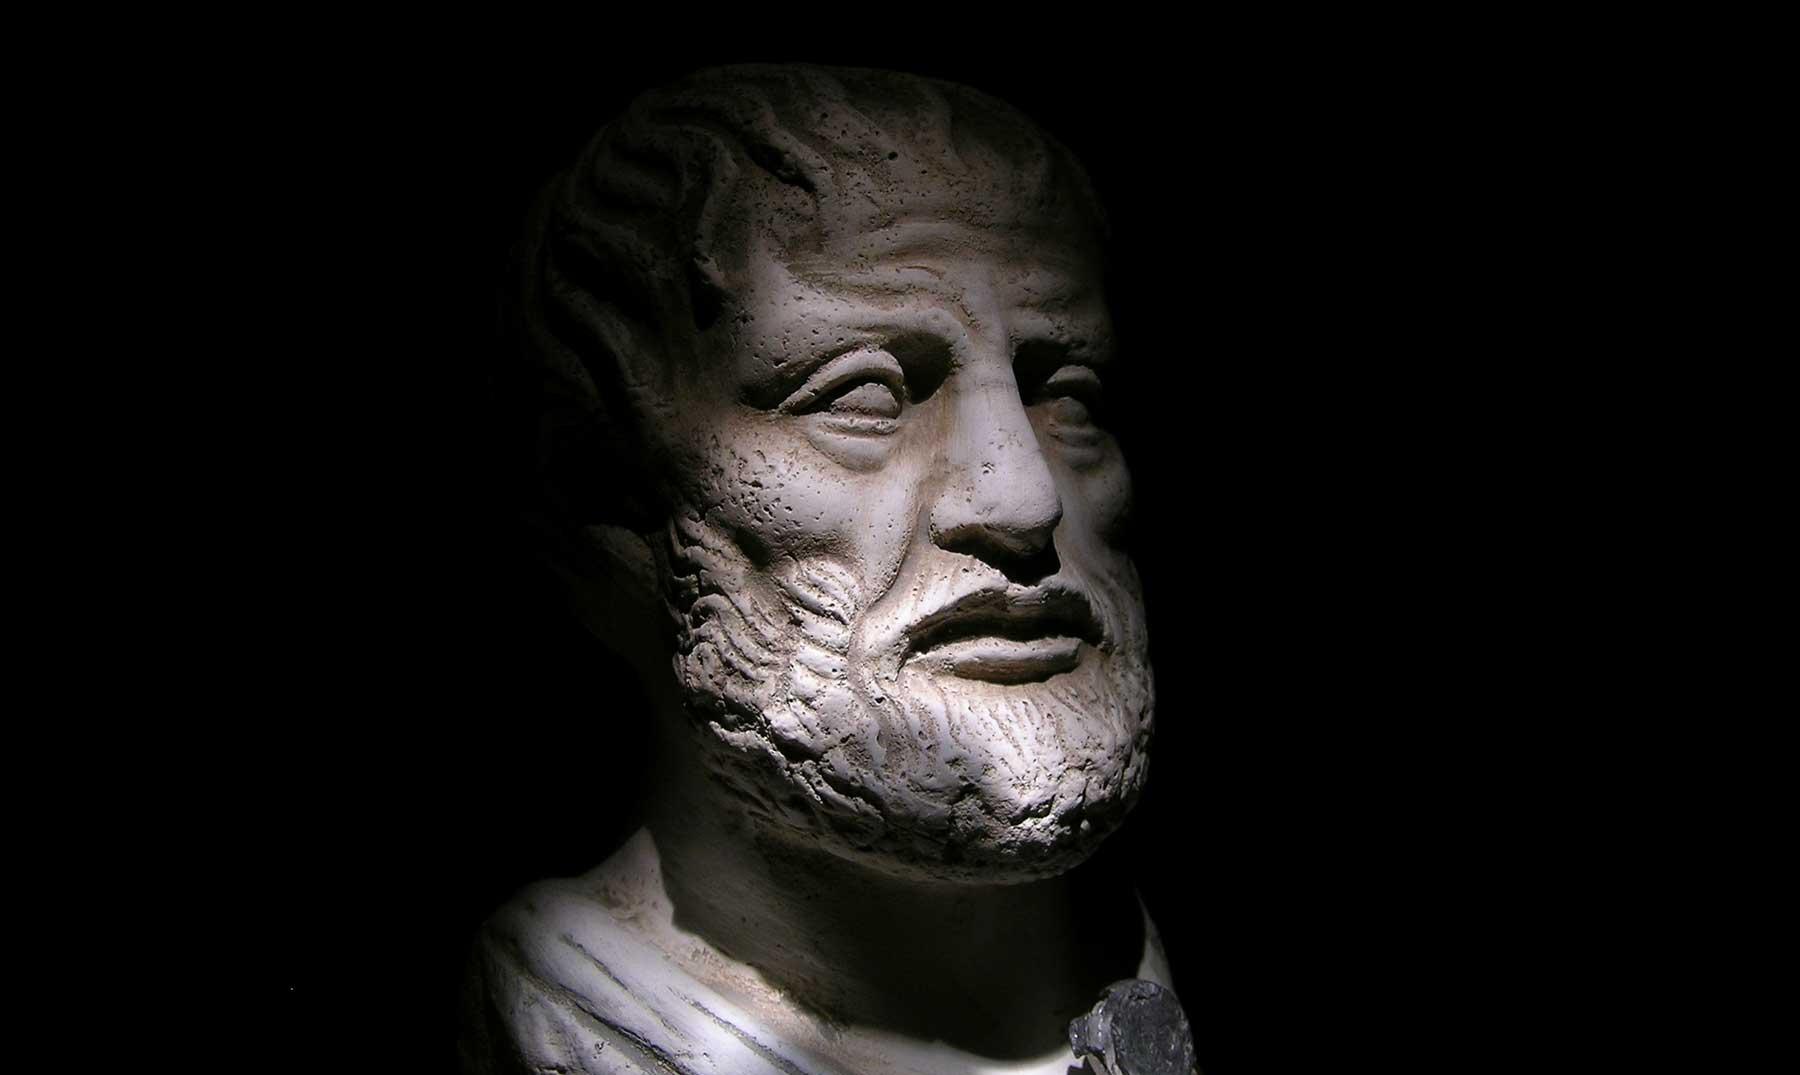 Frases De Aristóteles: 100 Frases De Aristóteles